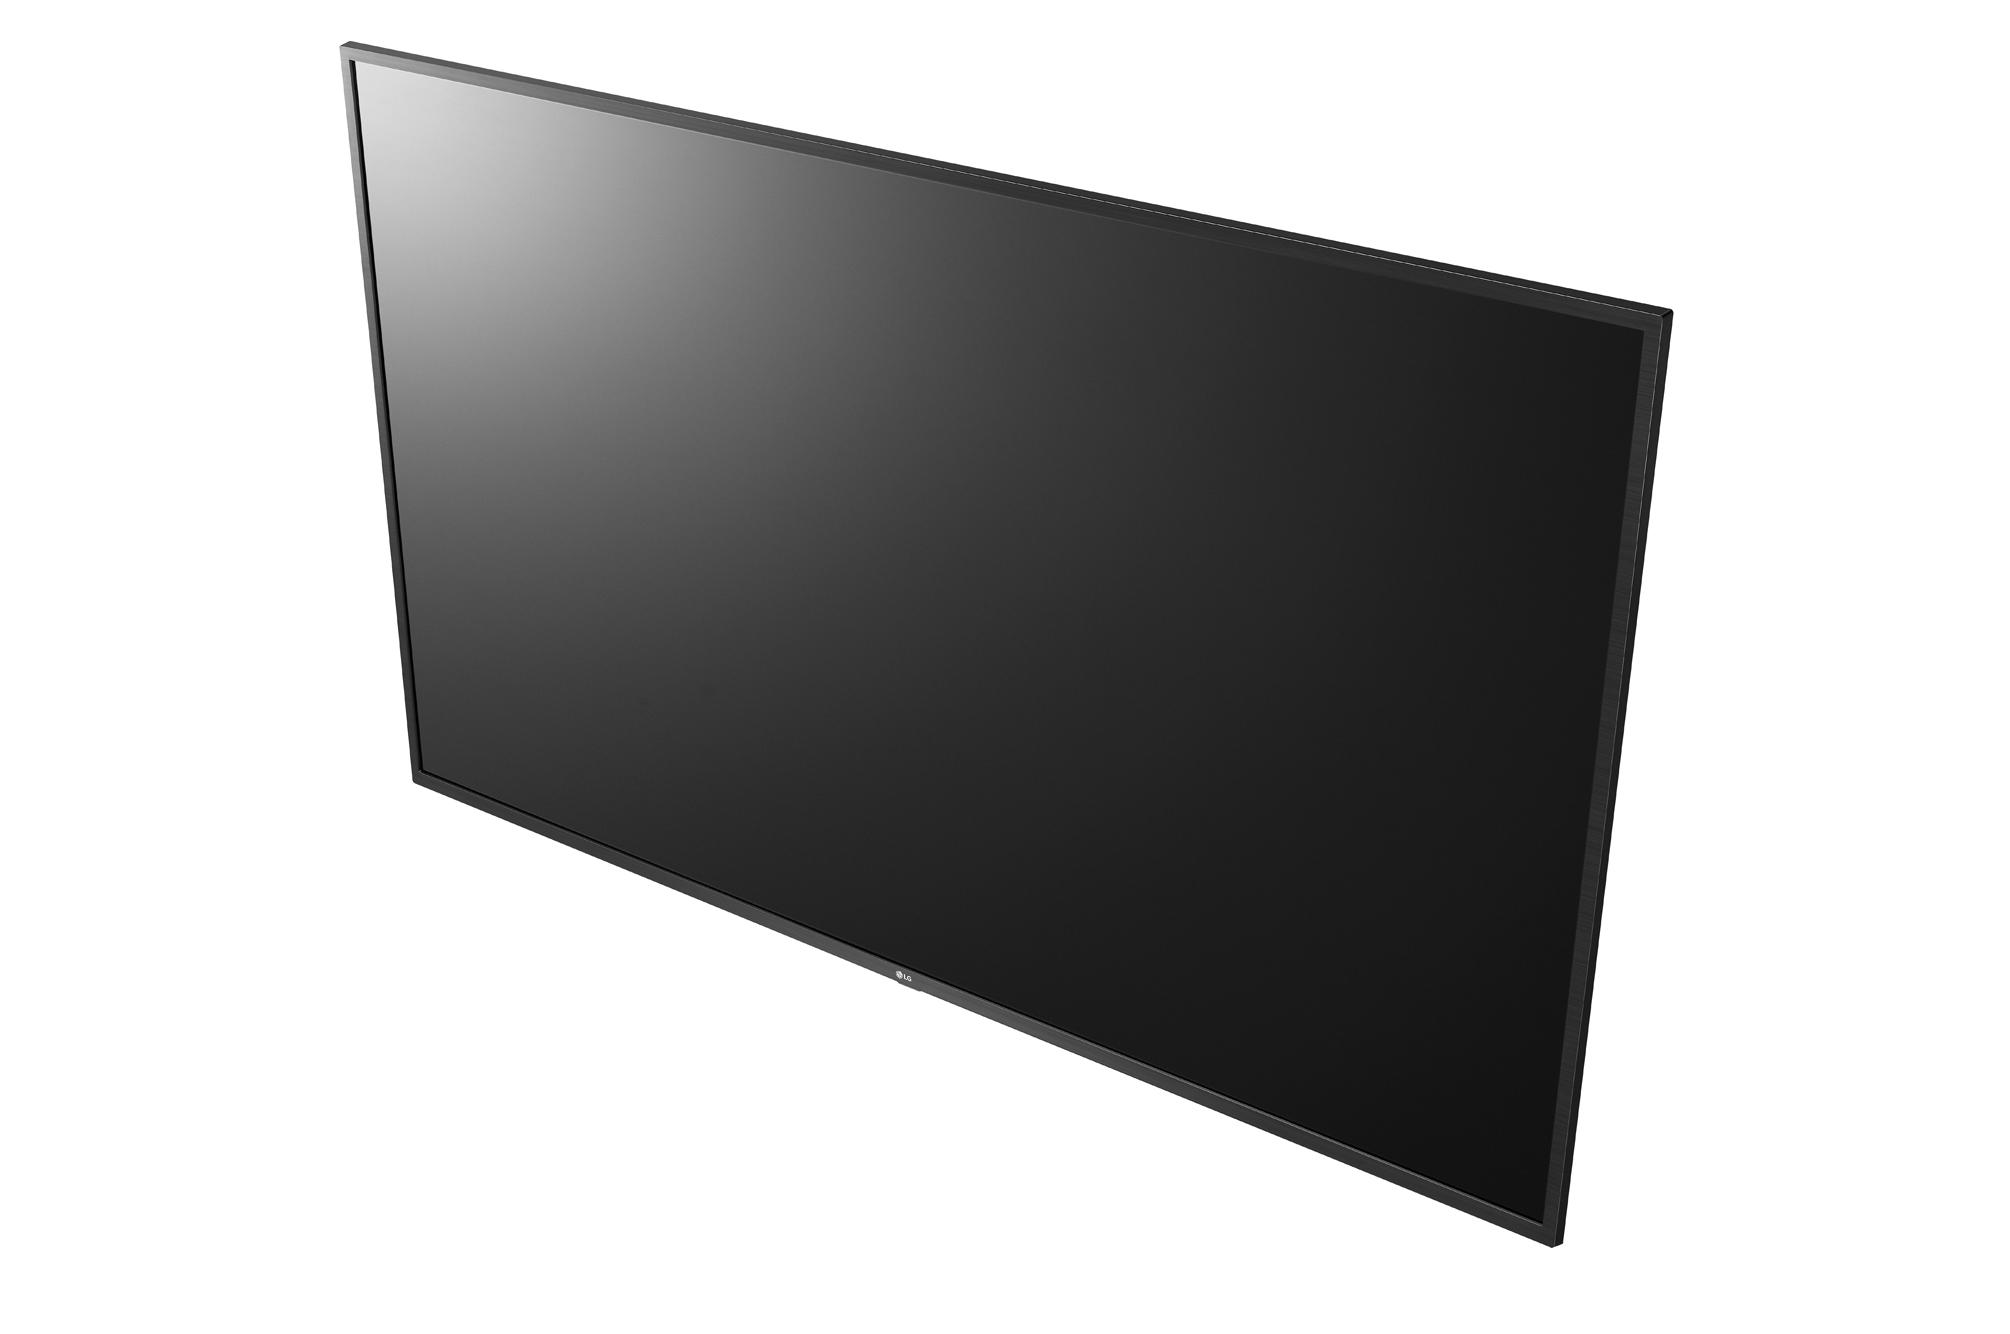 LG Smart TV Signage 65UT640S (ASIA) 9